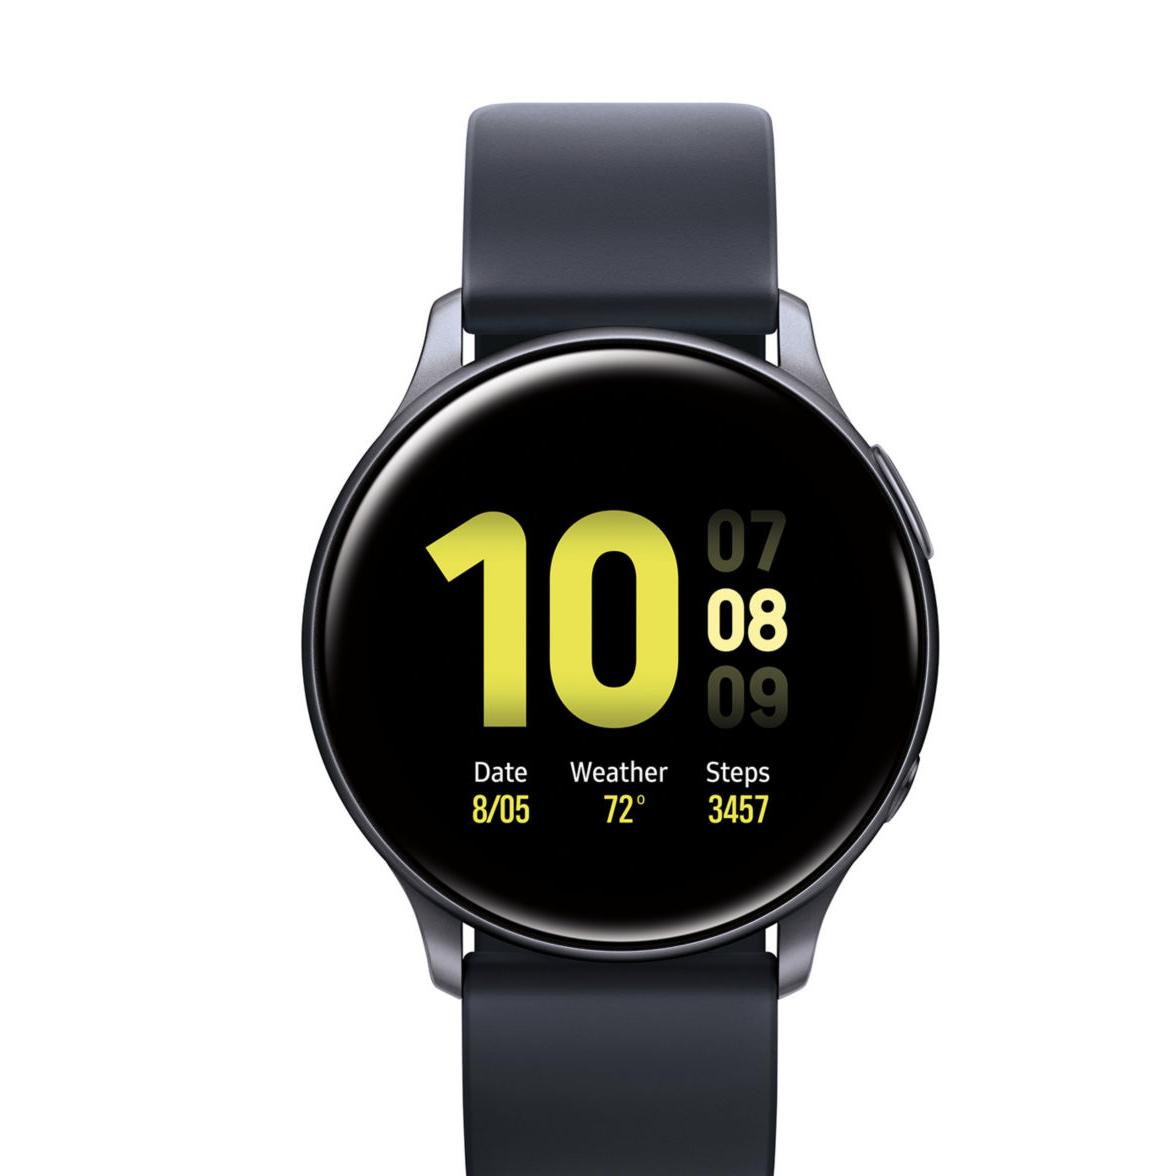 Reloj inteligente de la marca Samsung